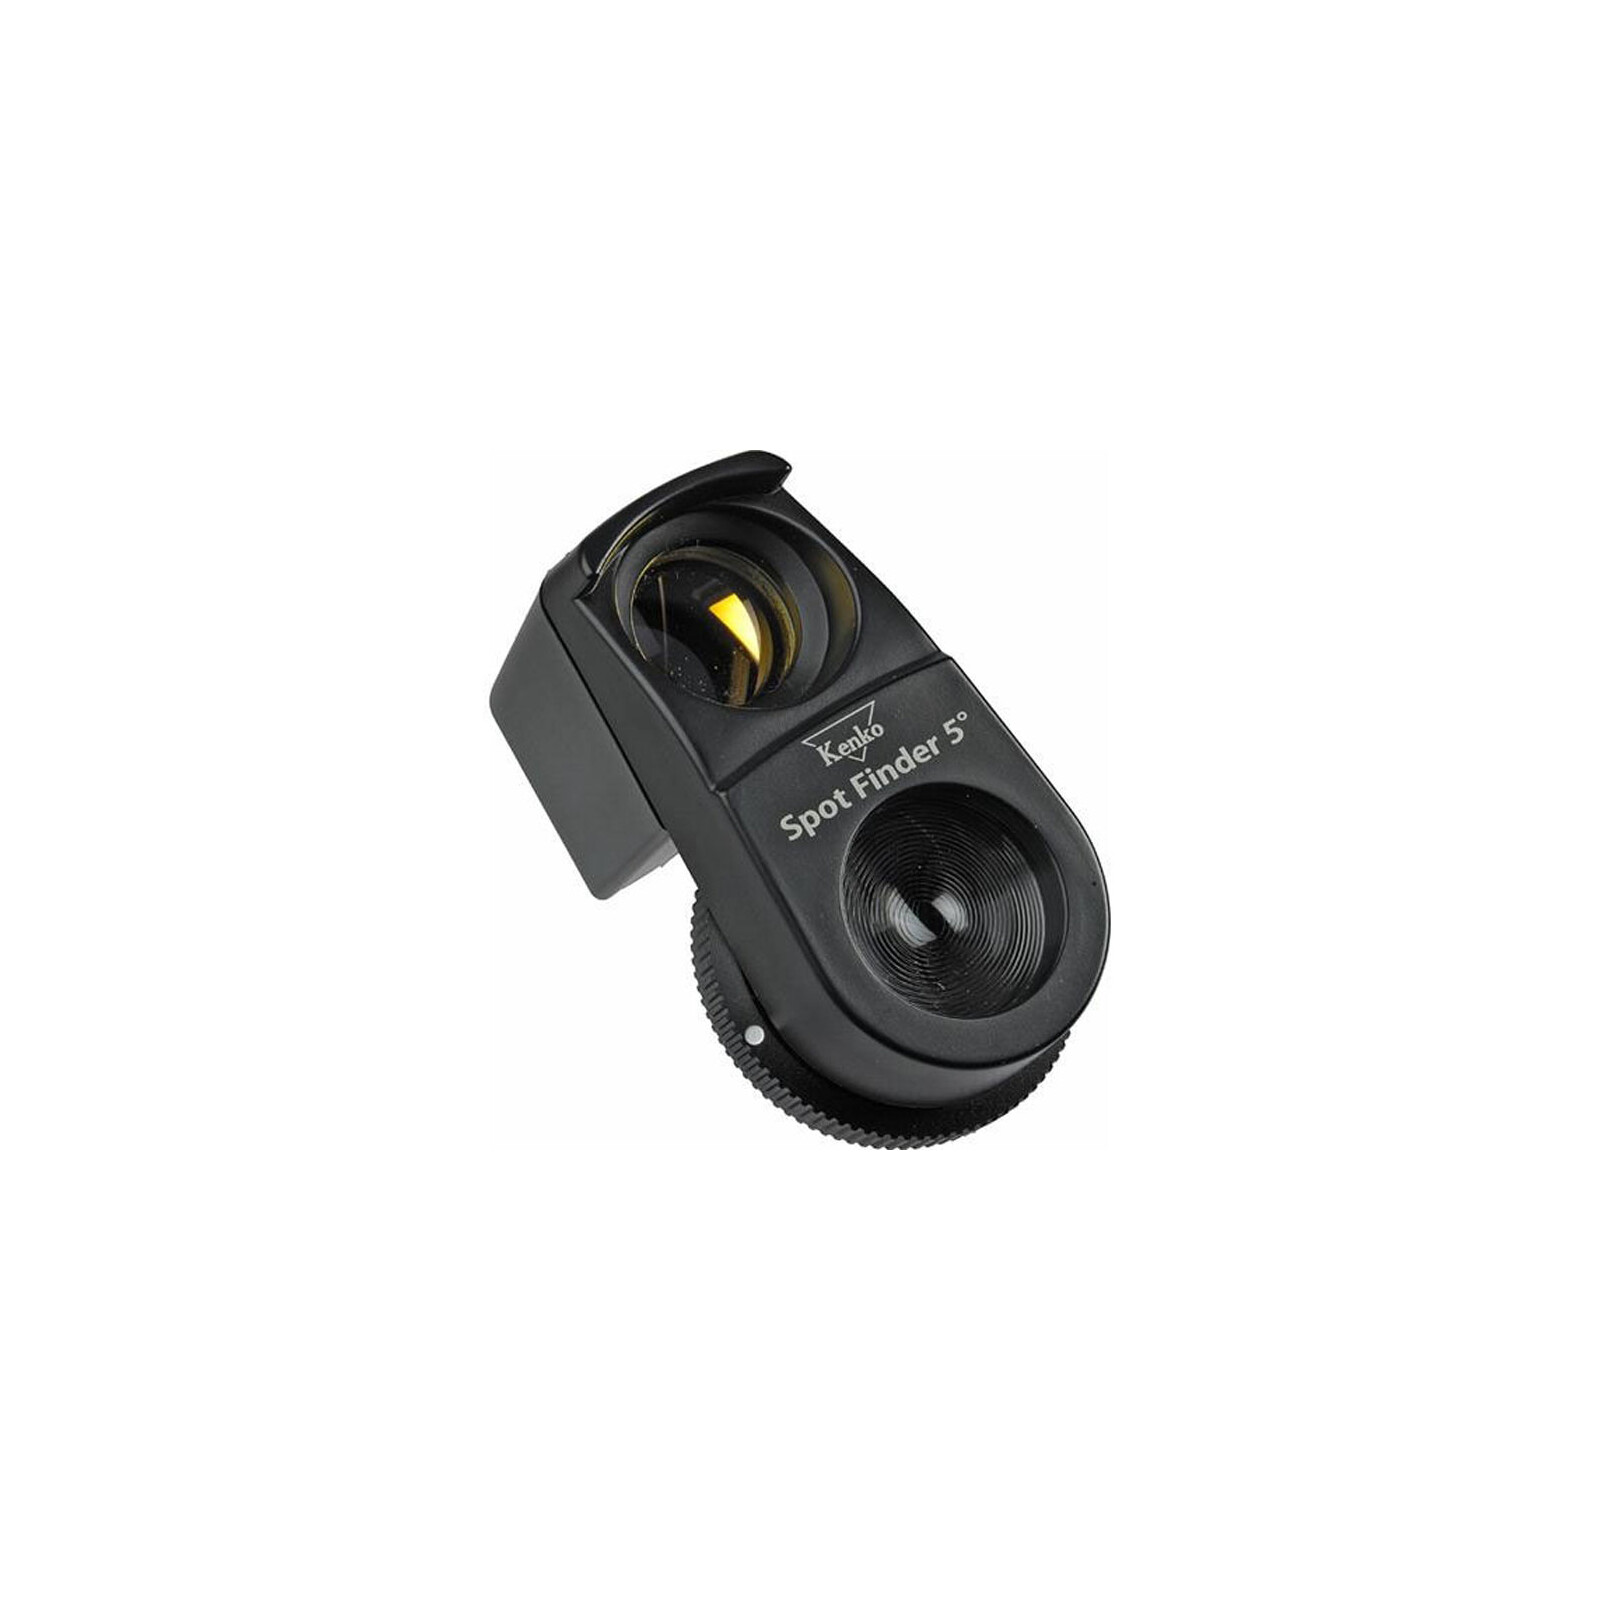 Kenko KFM-100 Spot Finder